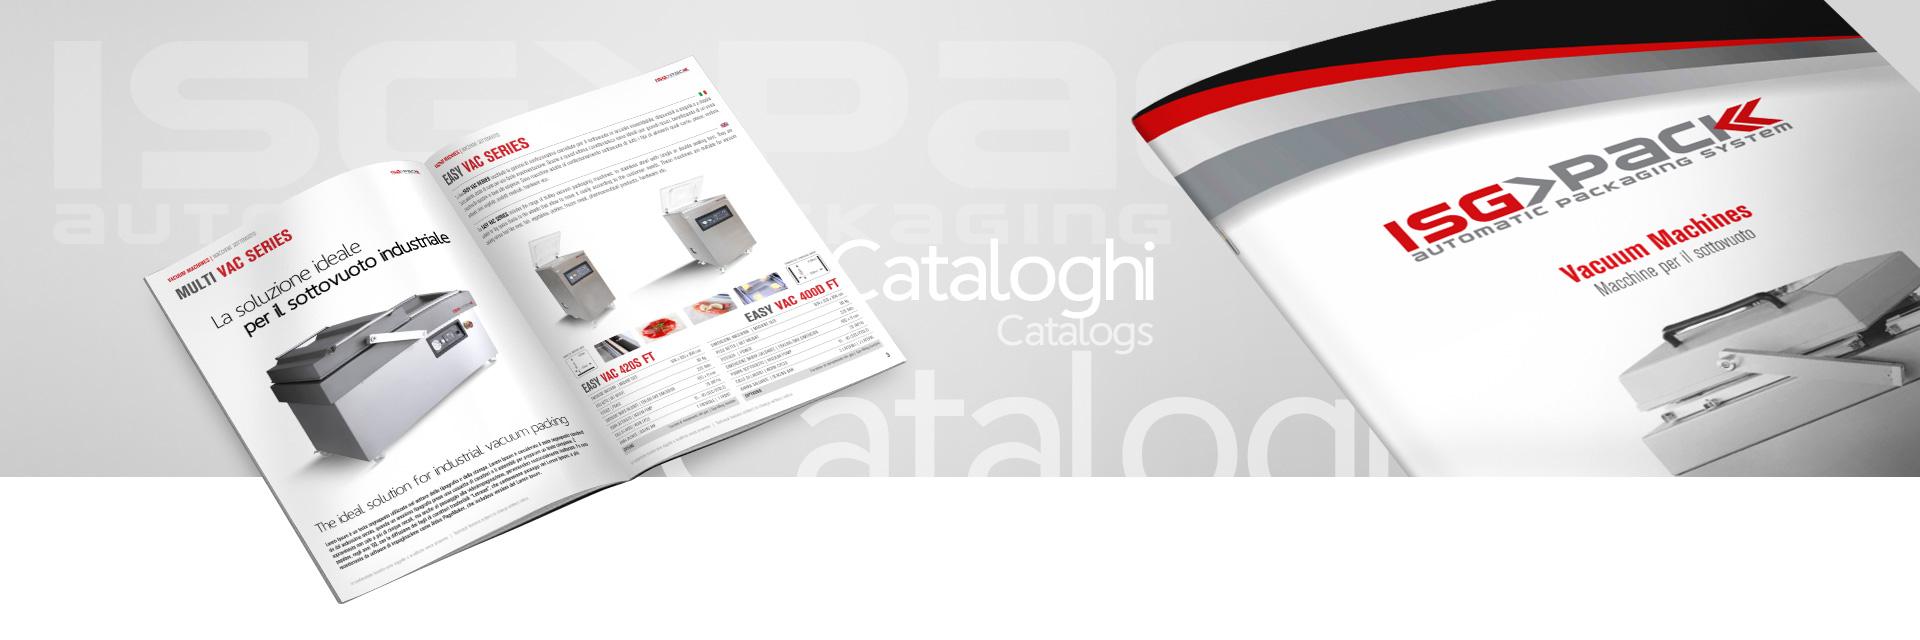 Cataloghi pdf isgpack